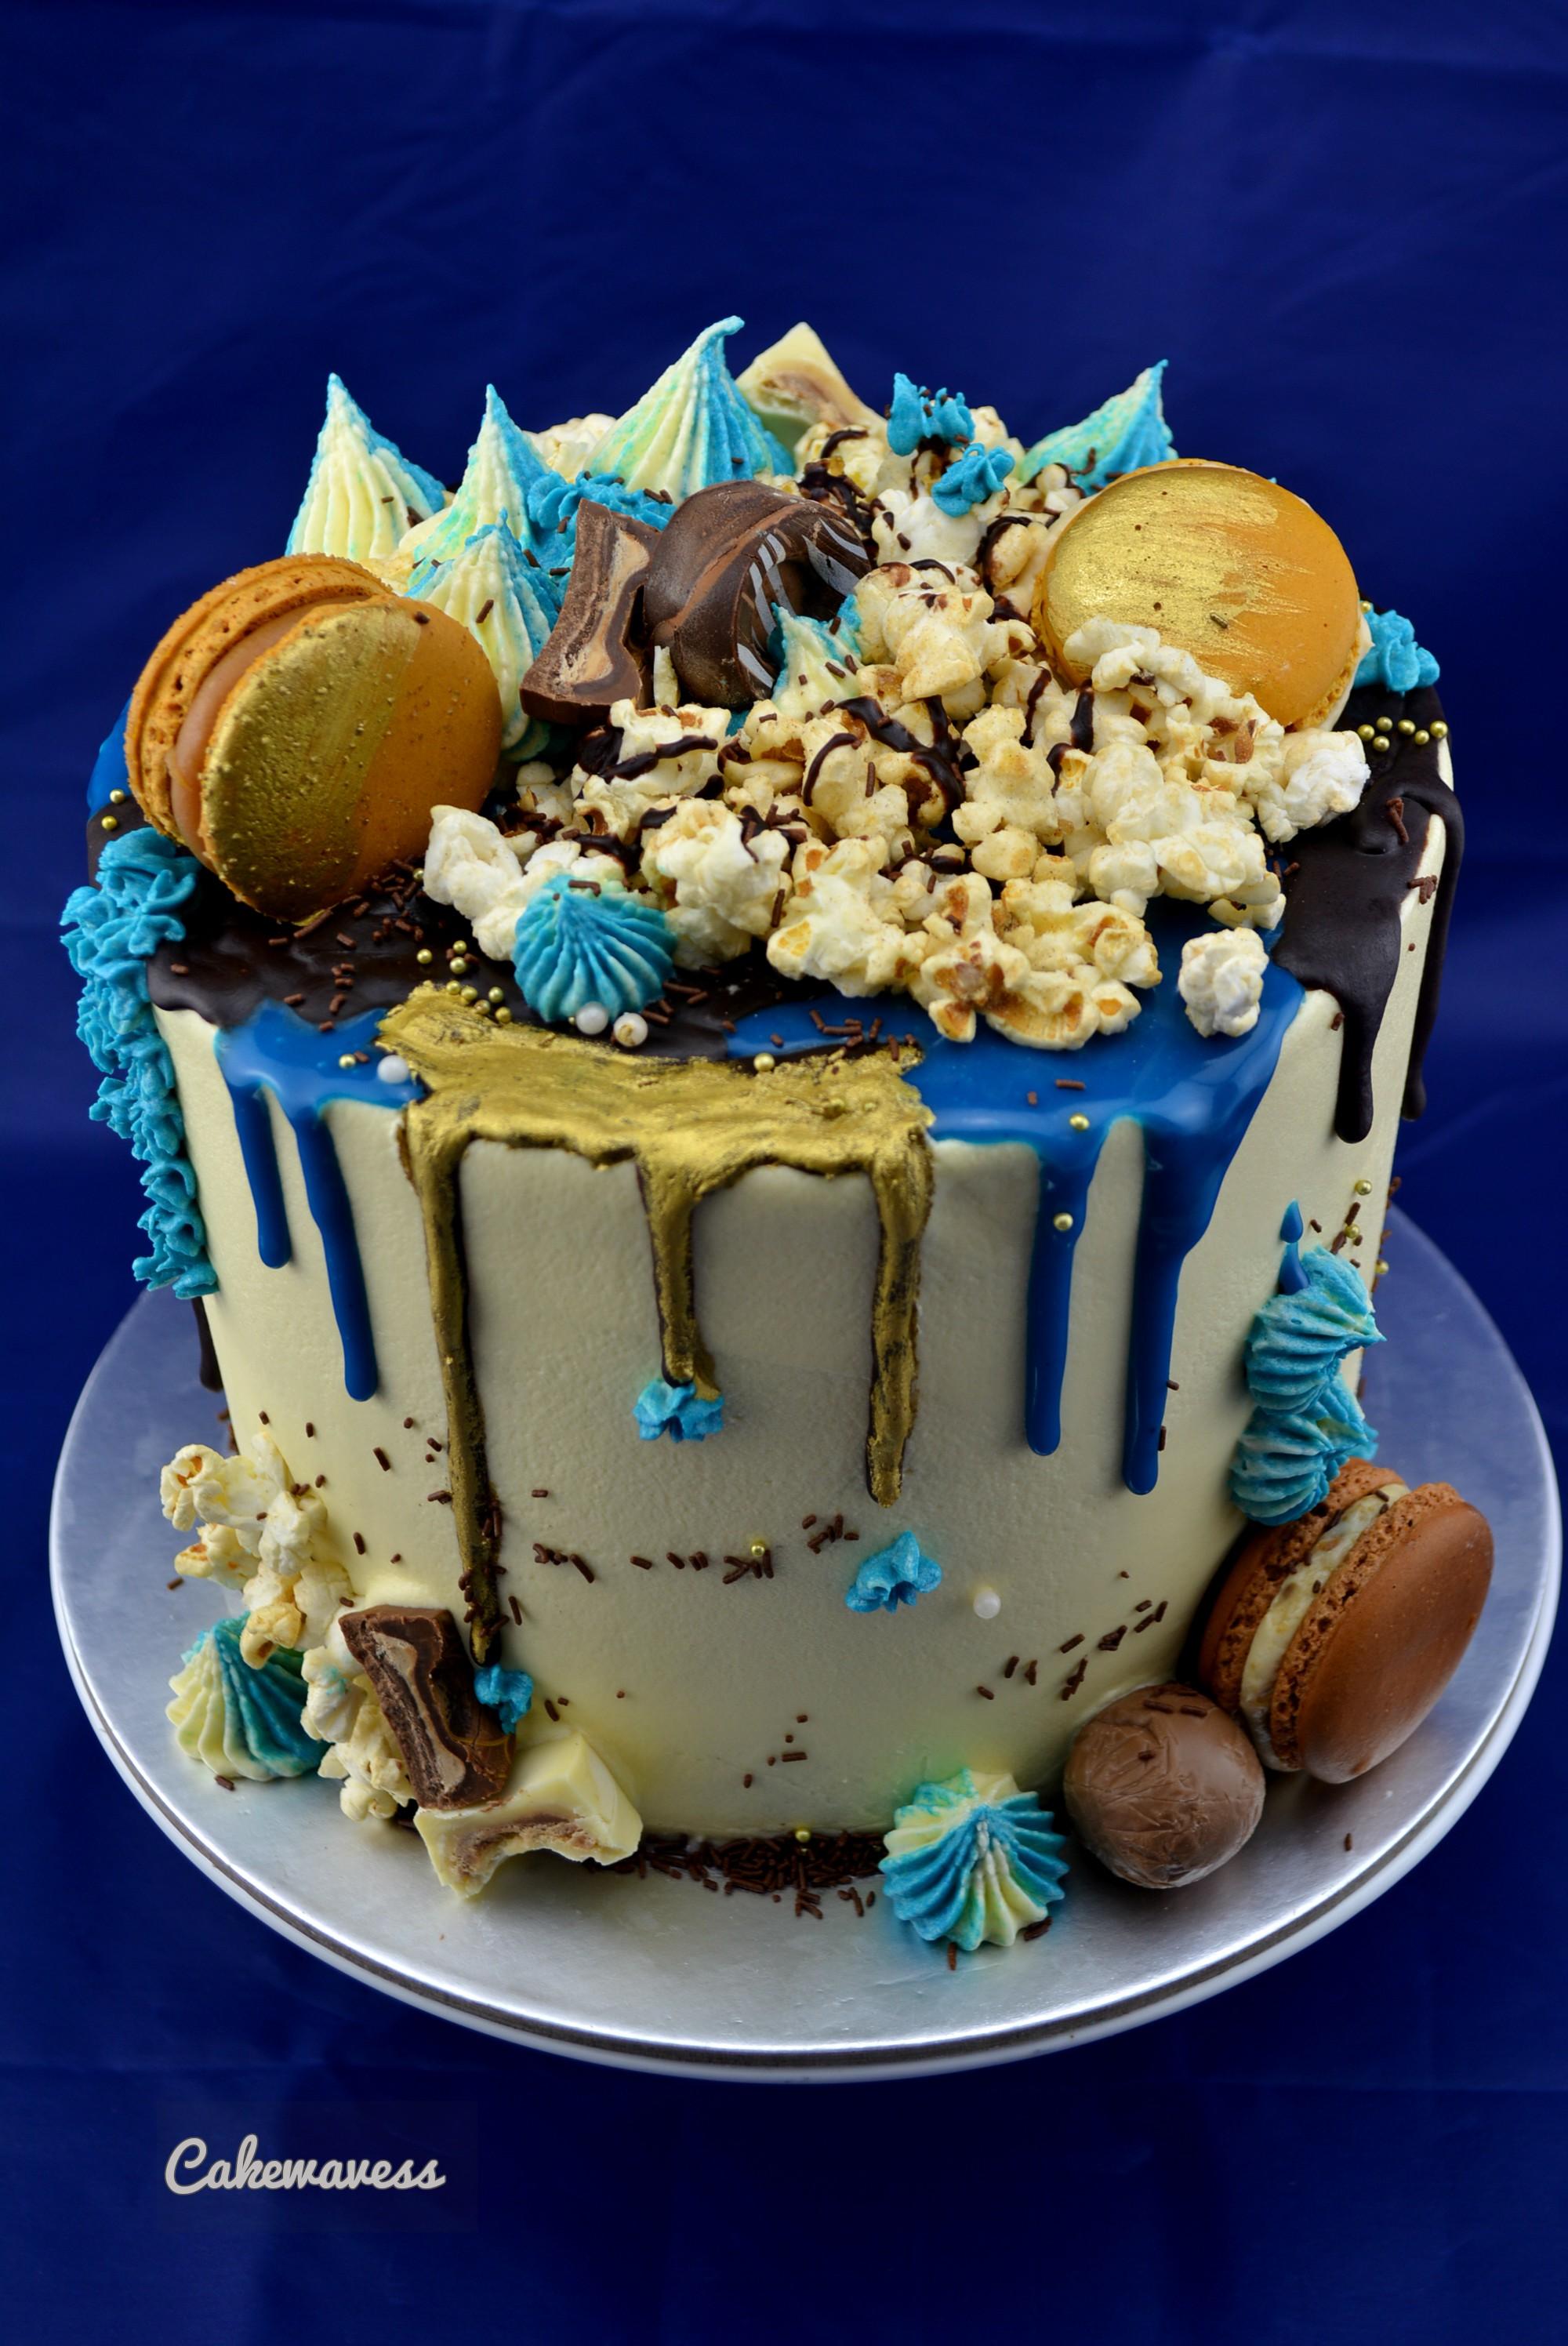 LoadedDripCake_cakewaves